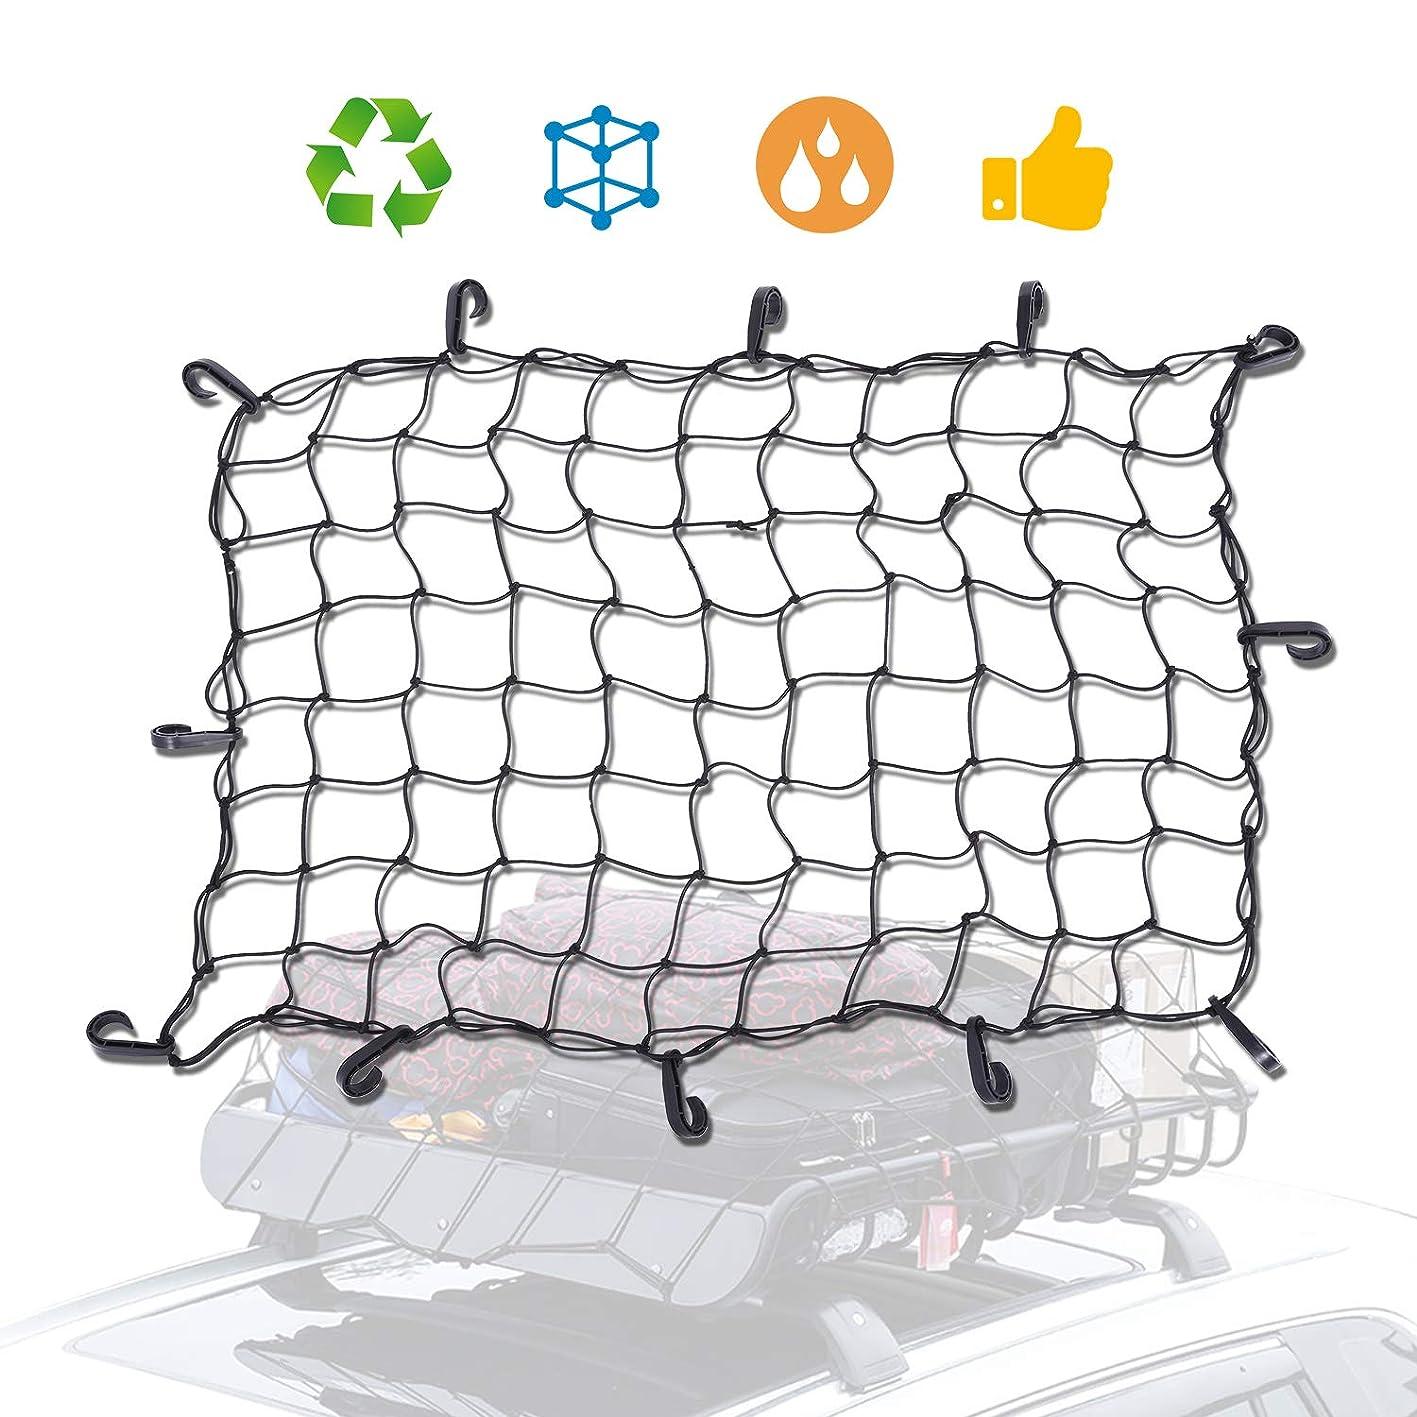 COOCHEER 120x90cm Cargo Net, Large Universal Nylon net Large Capacity 12 Hooks Roof Luggage net Car Trunk net Pocket Stretches Mesh Net for Cars fbbdftzybhr828